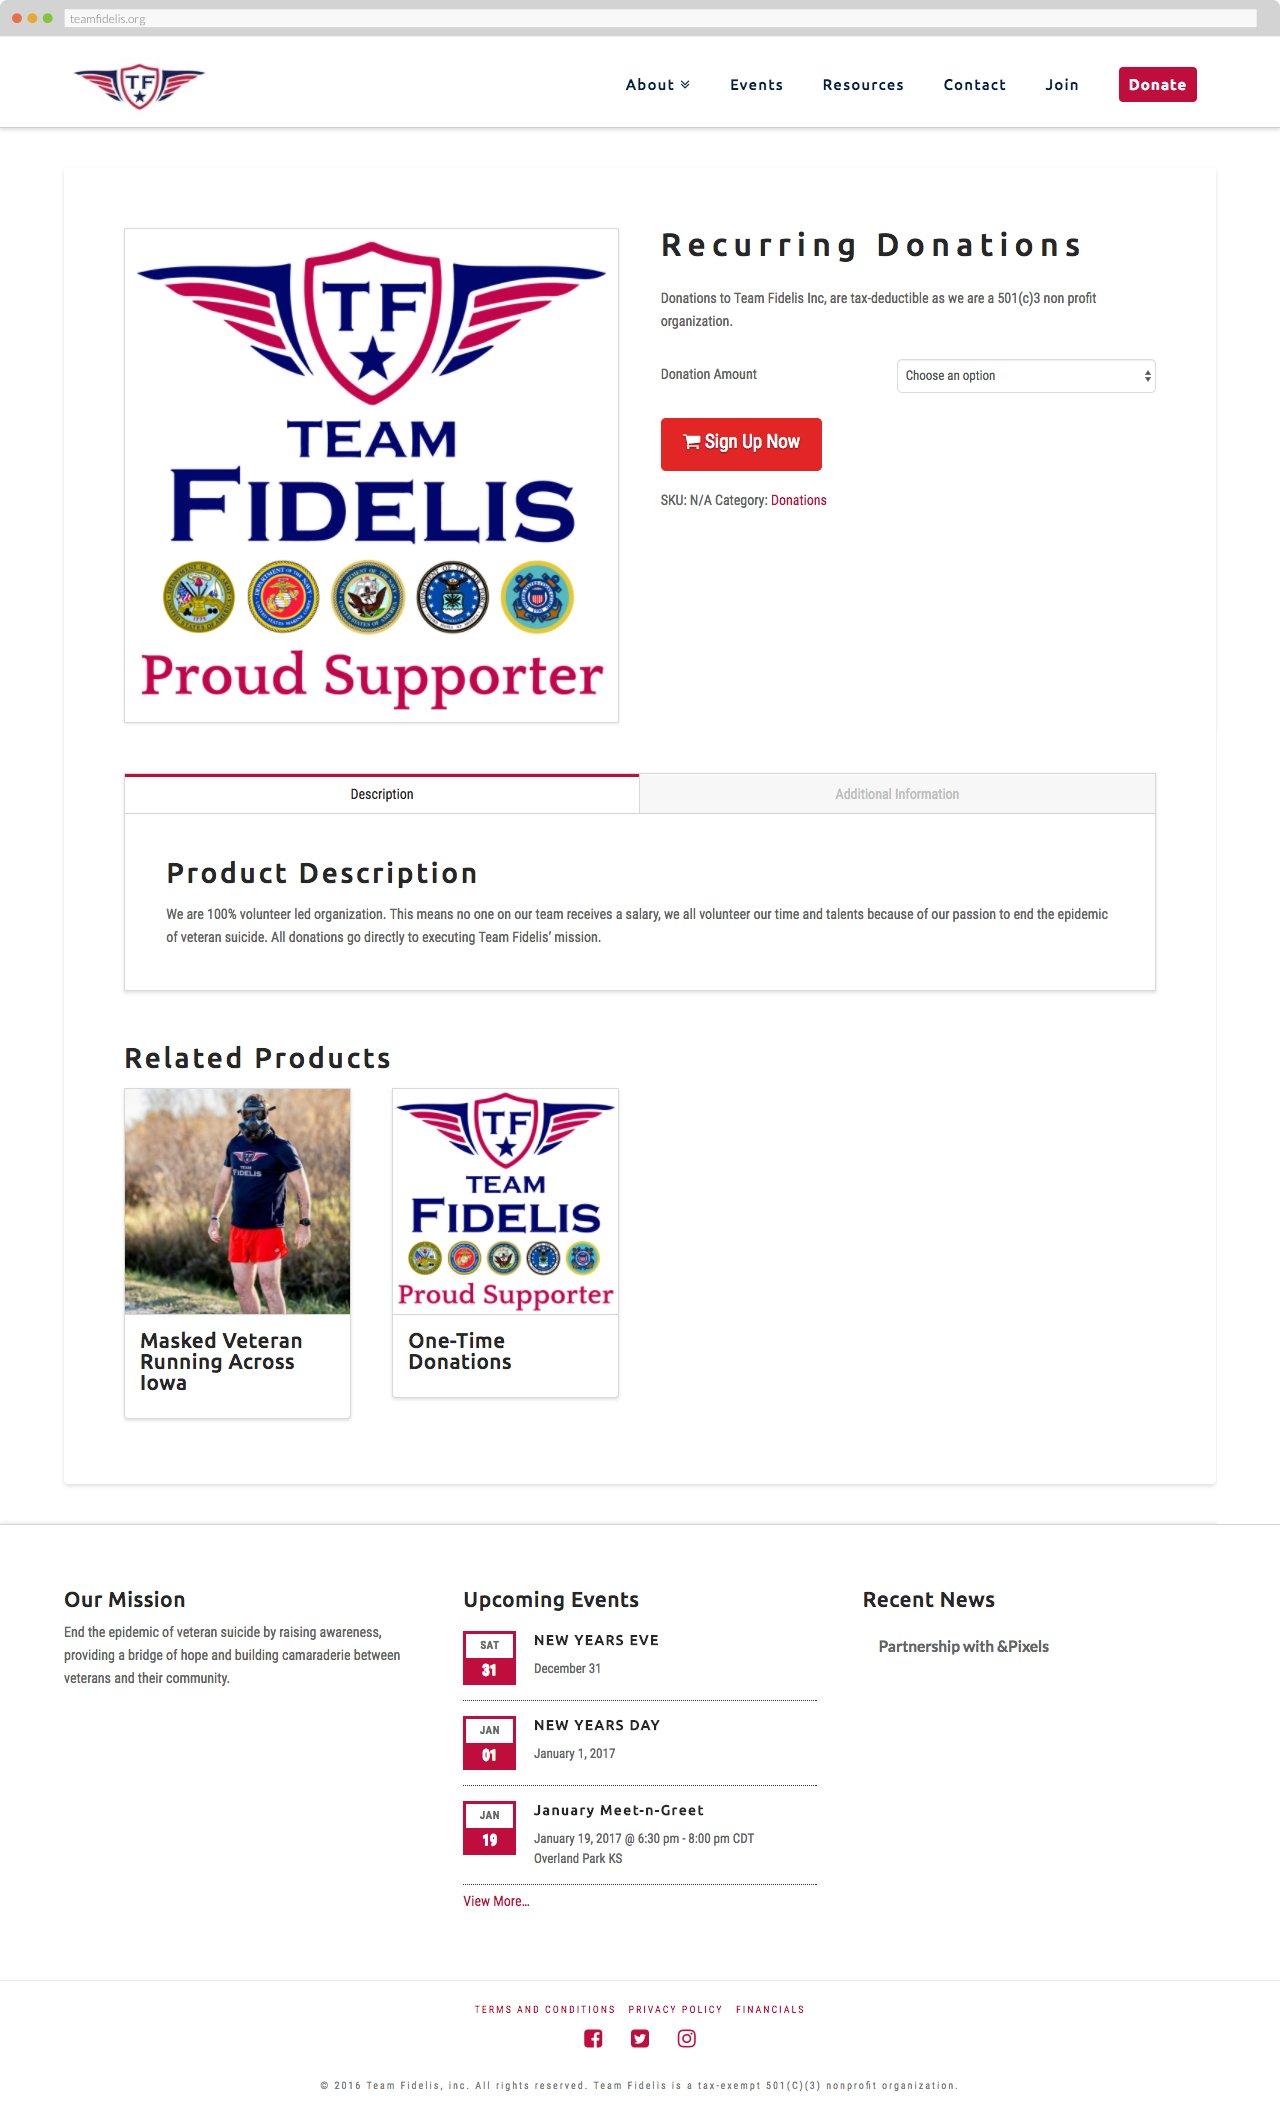 Team Fidelis - Recurring Donations